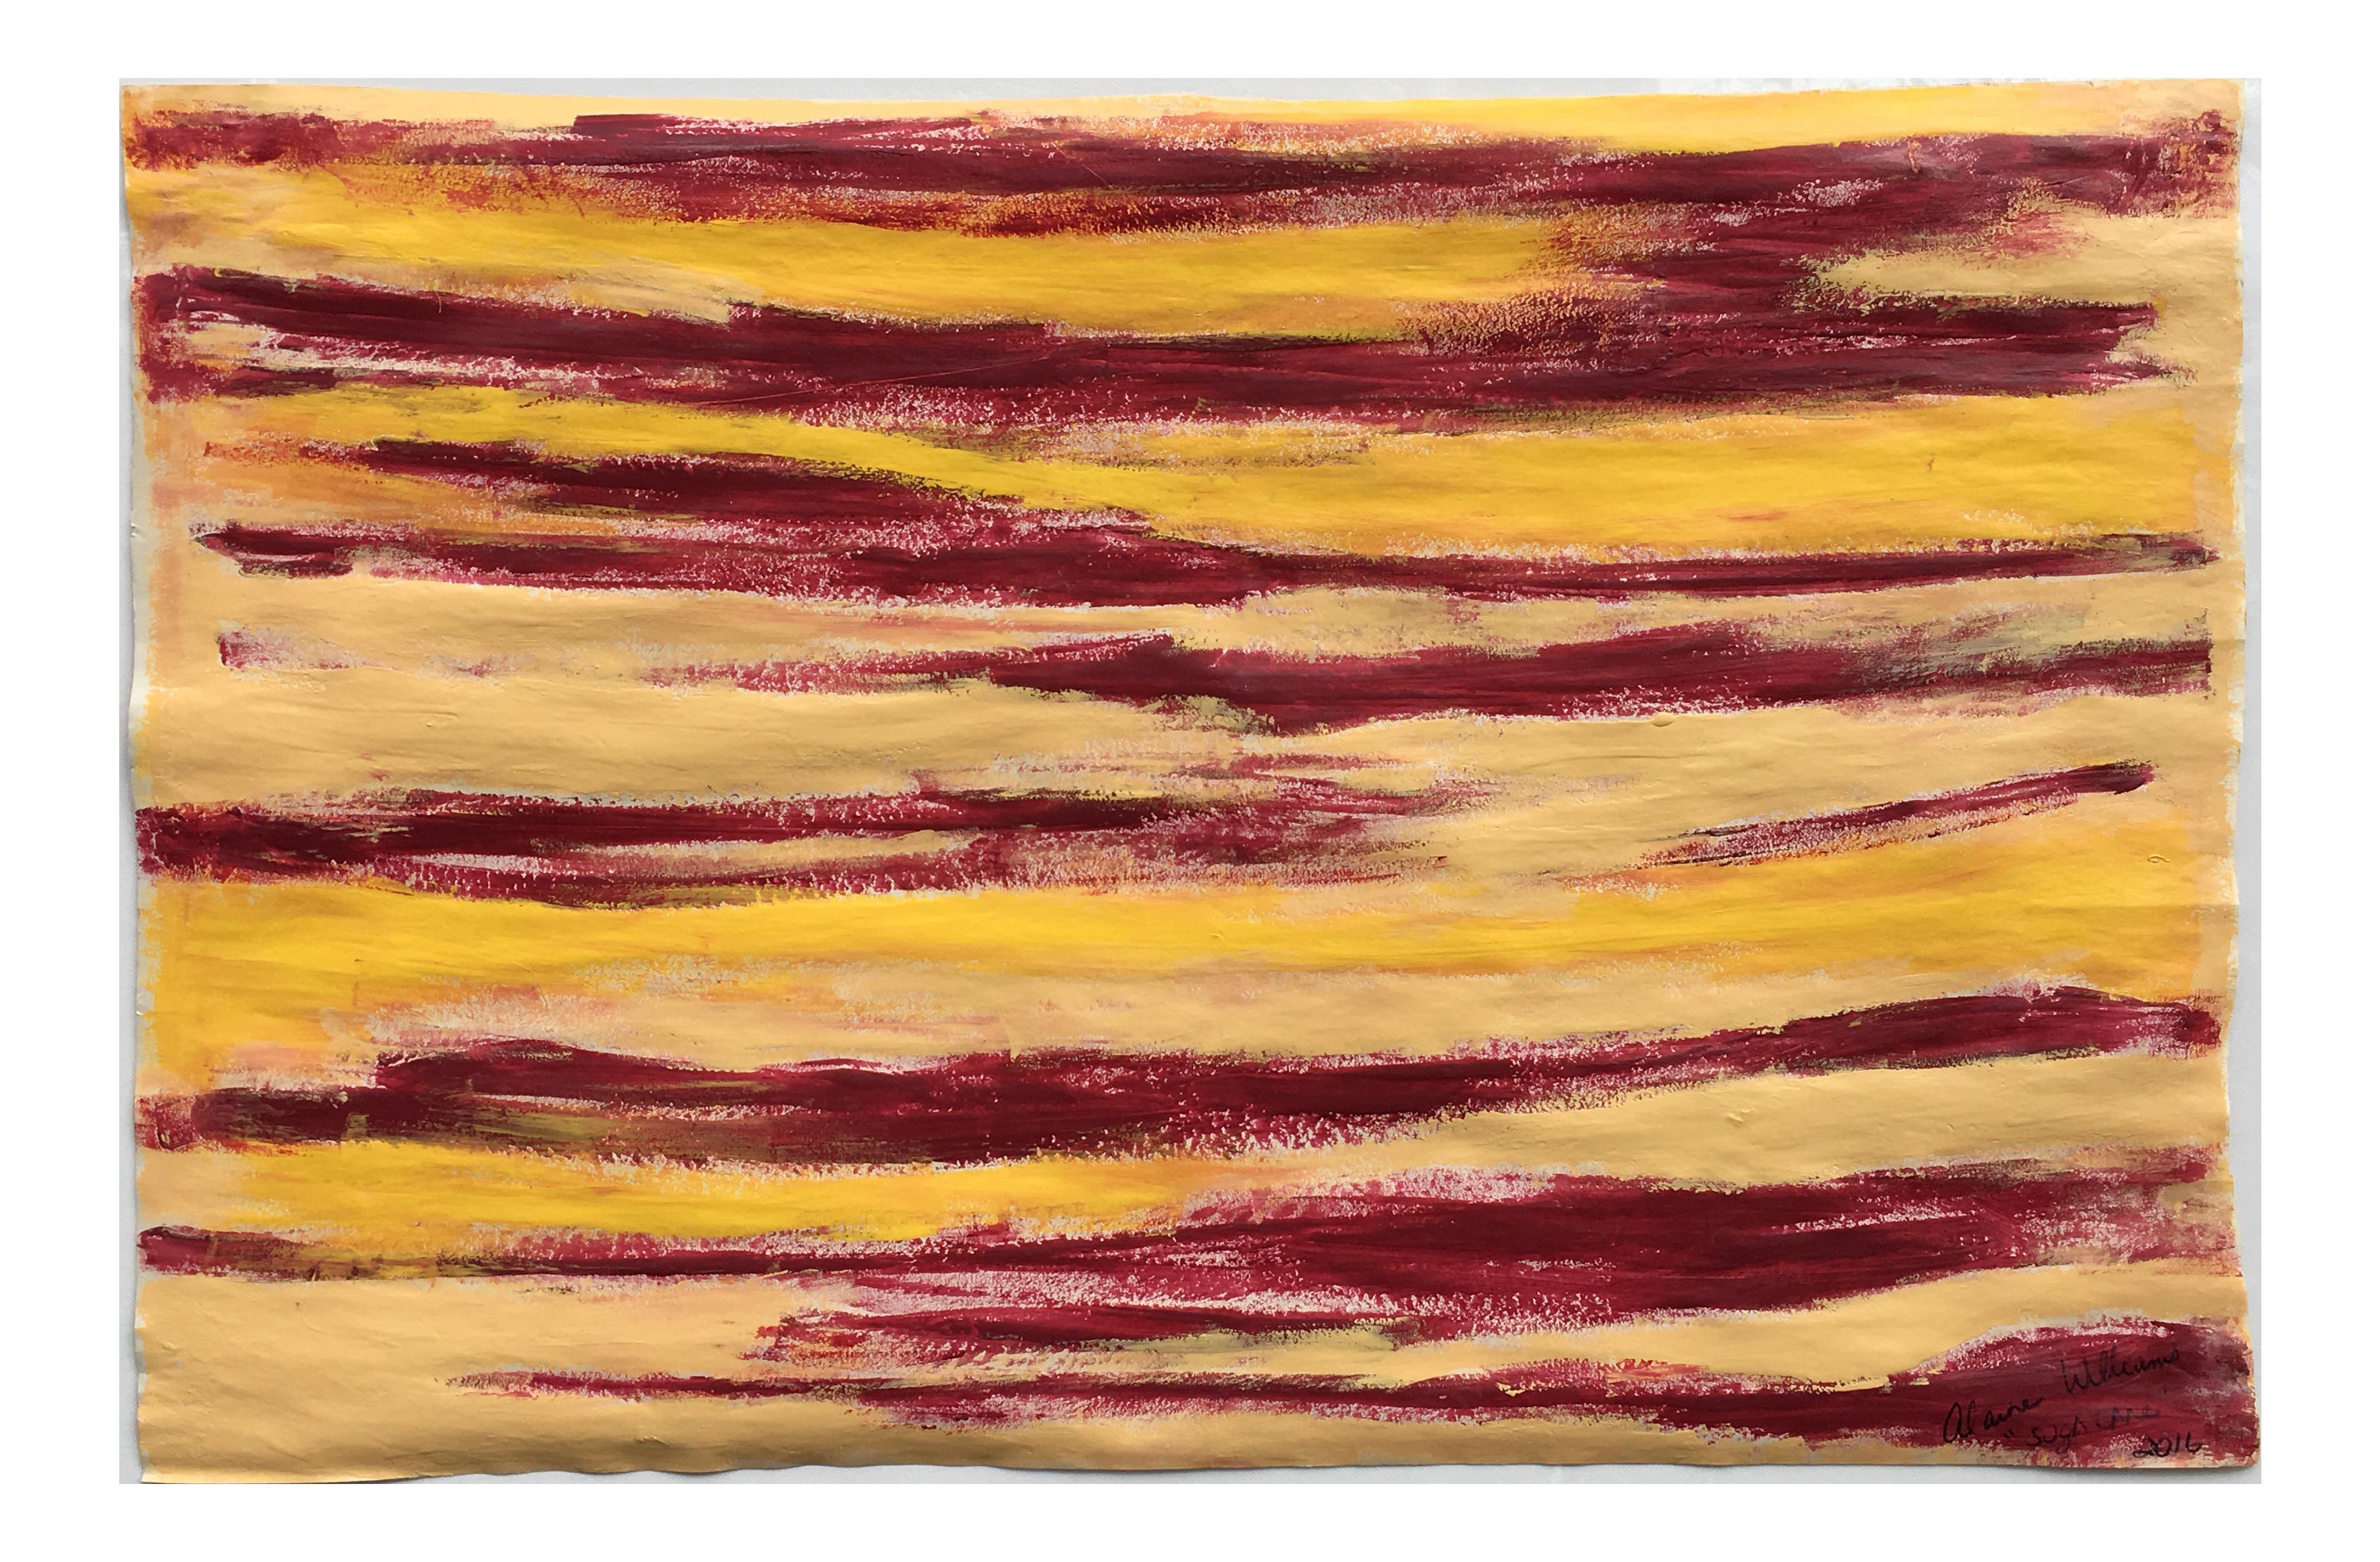 Suga Lane Abstract Red Yellow Streak Painting Abstract Red Yellow Painting